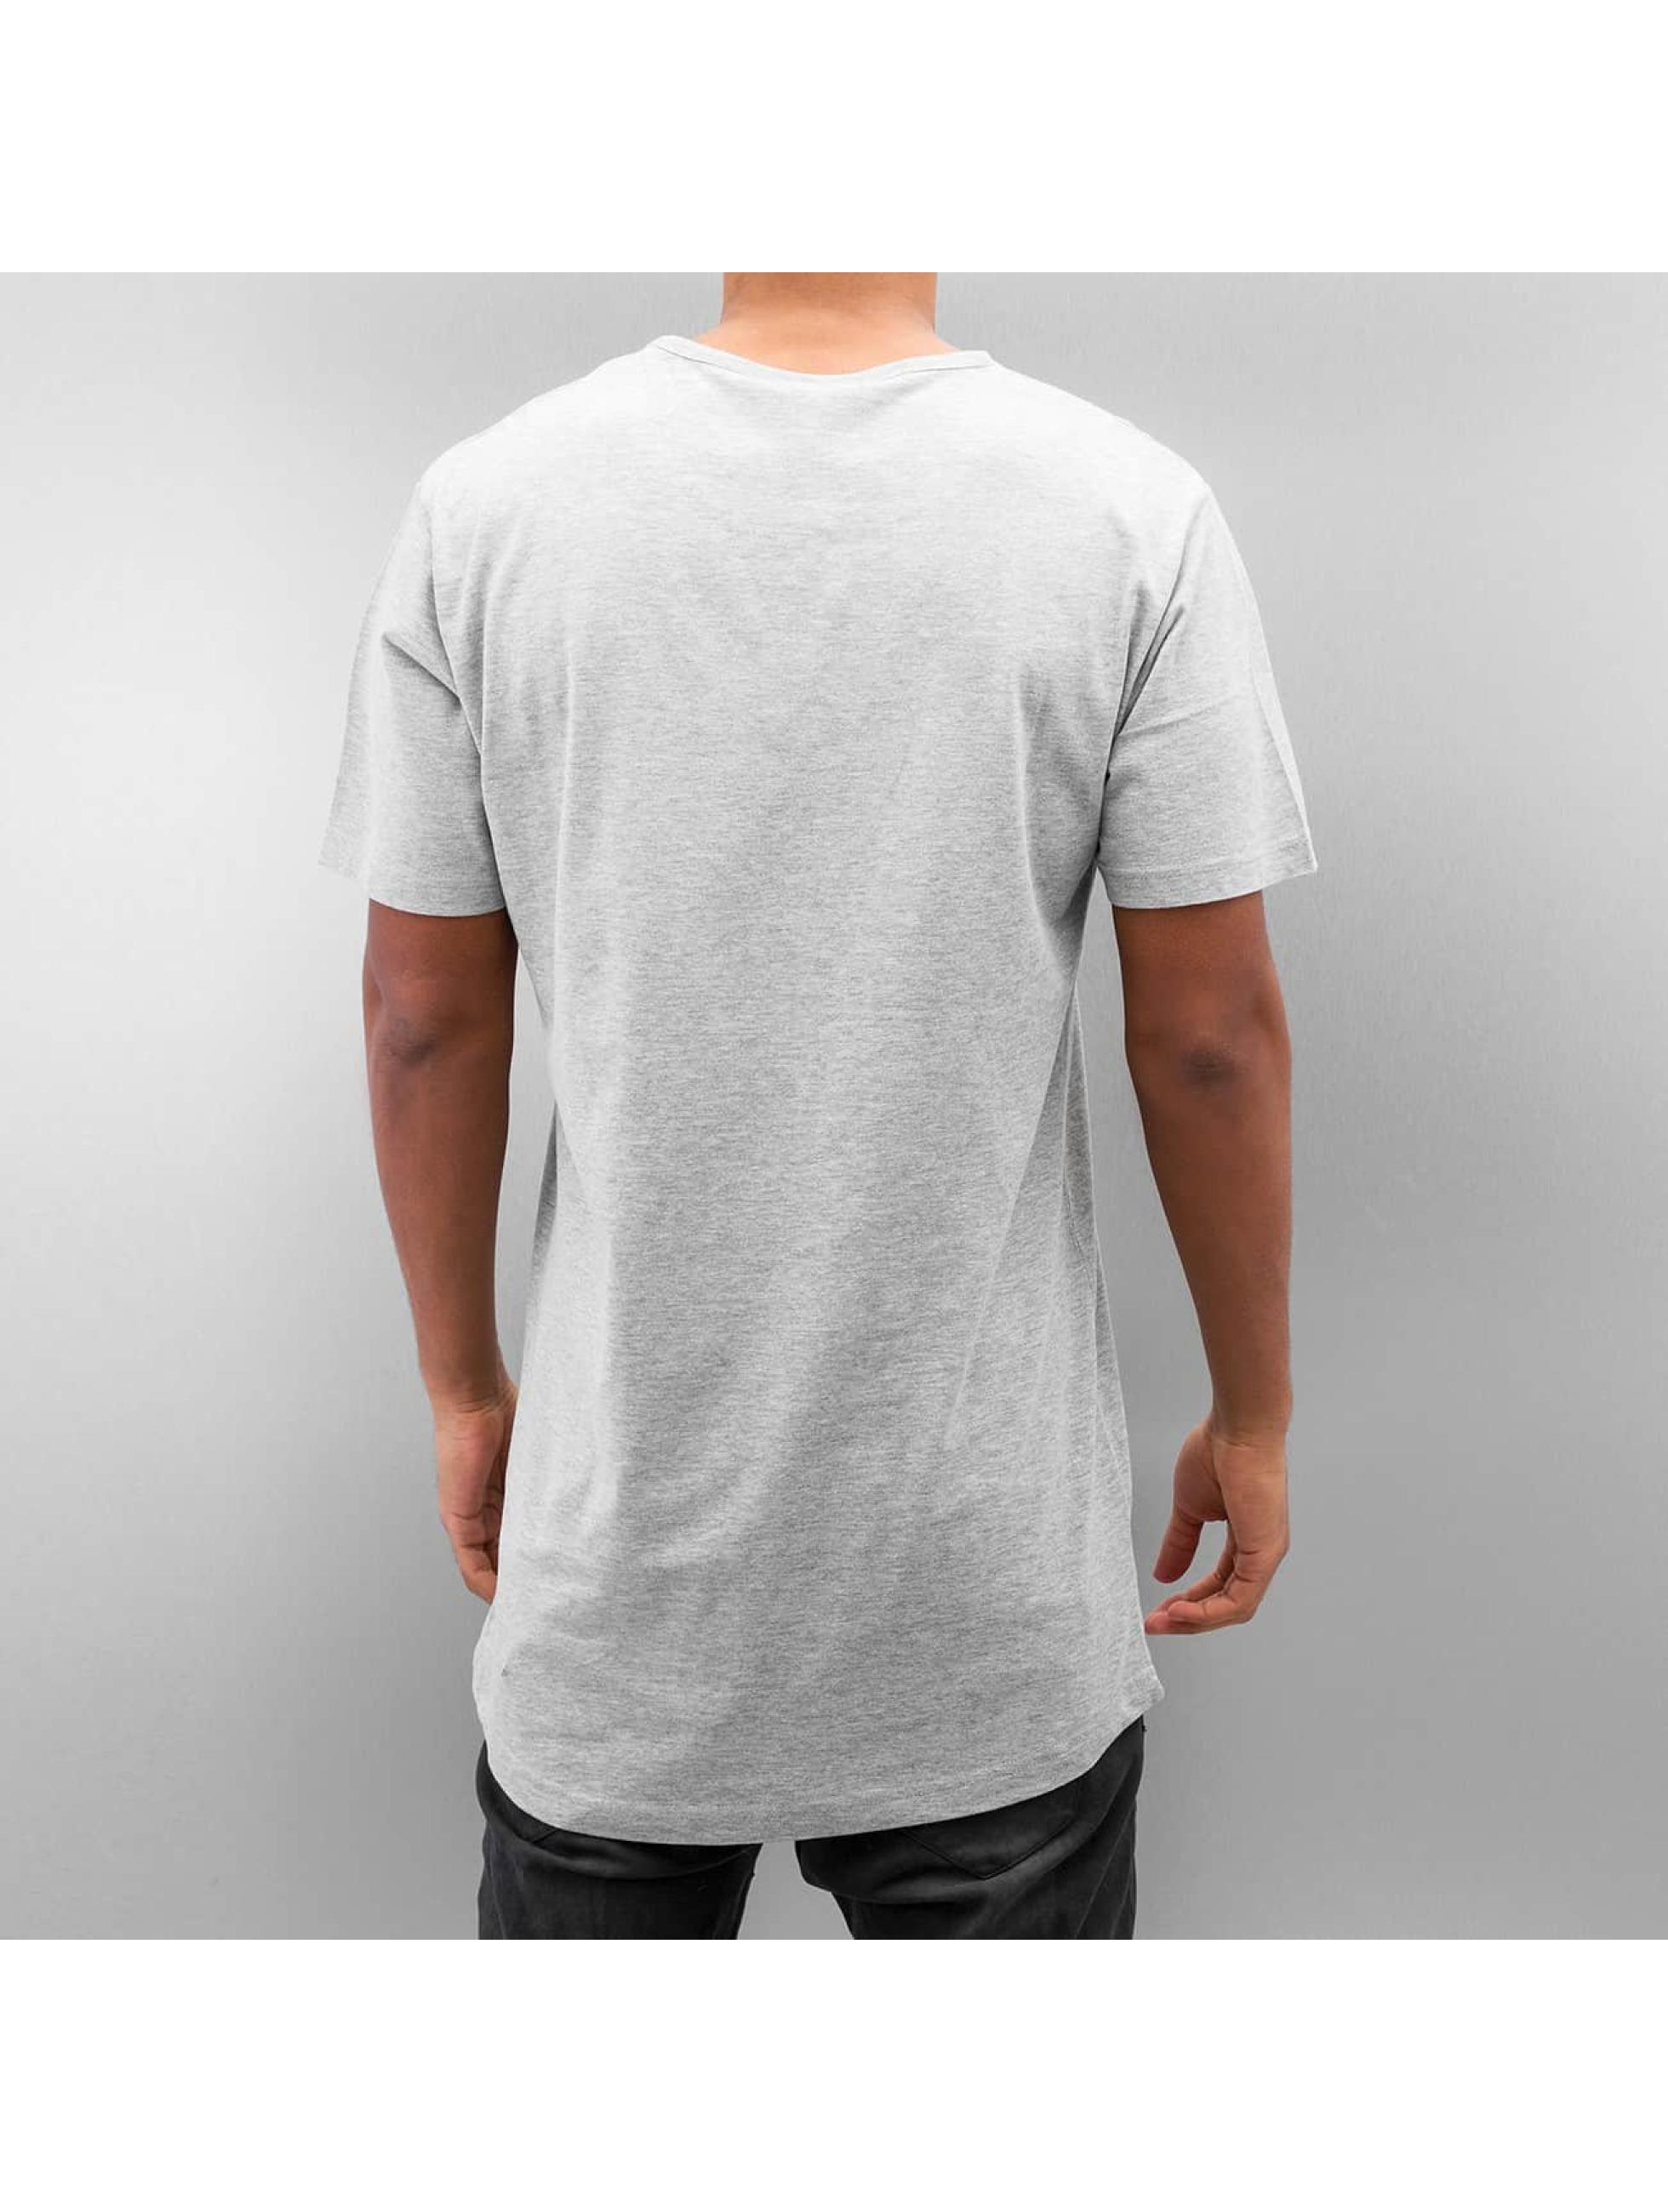 Urban Classics t-shirt Peached Shaped Long grijs